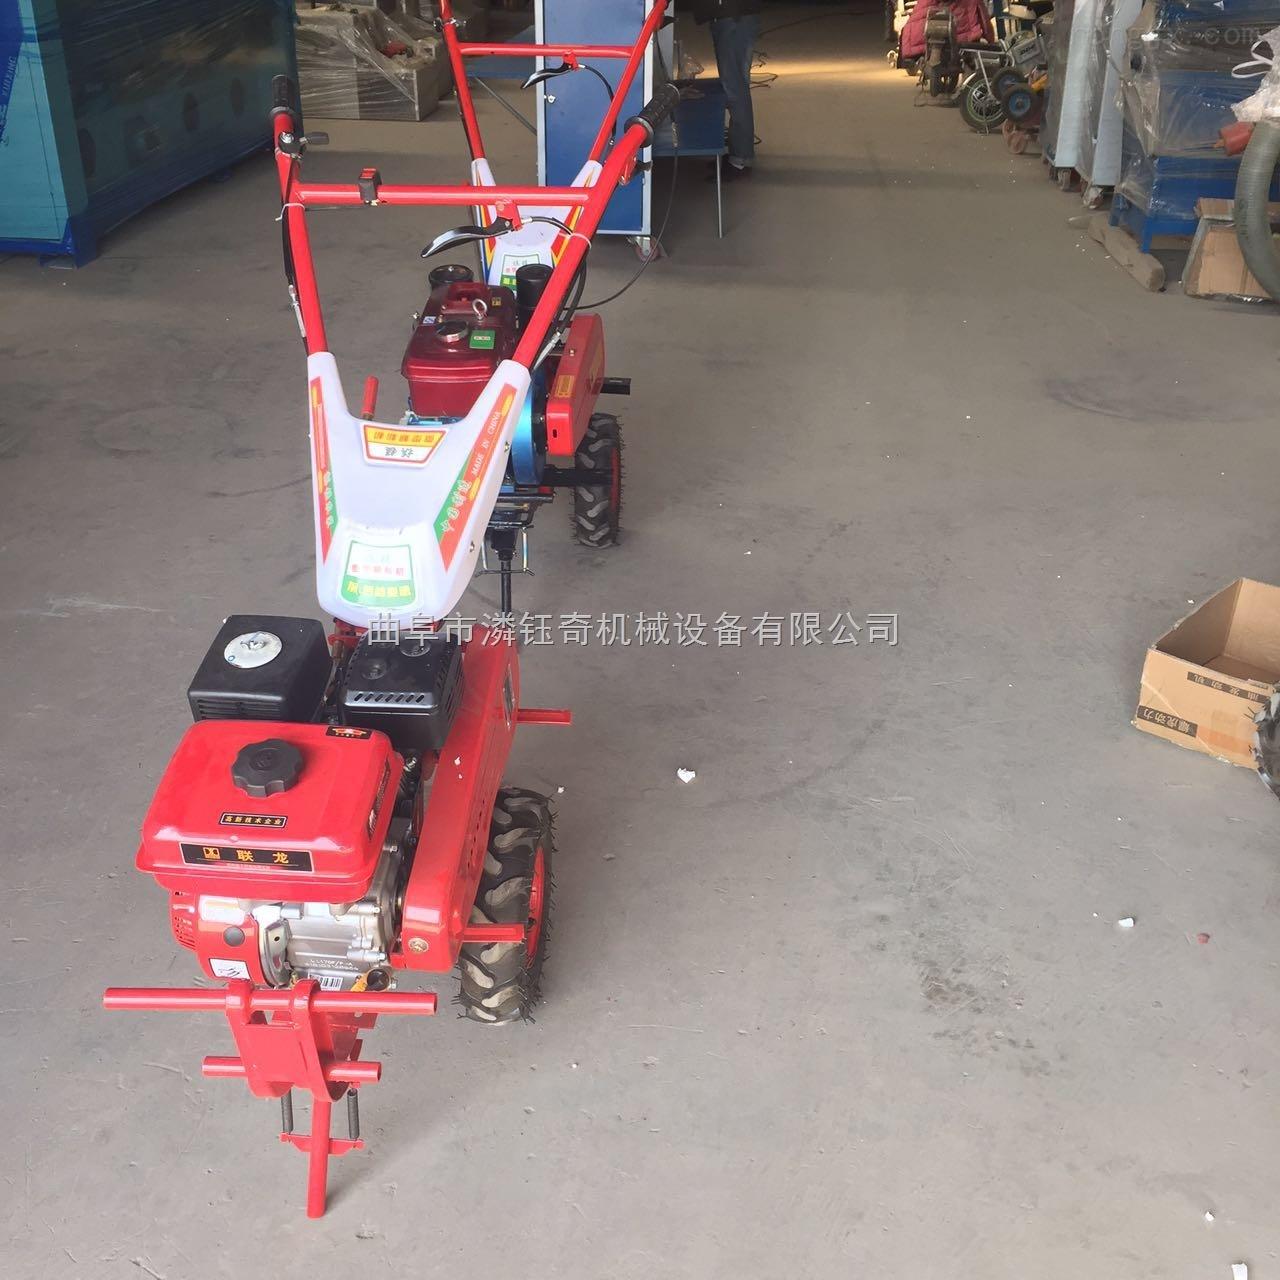 LY-23-農機起壟器 風冷柴油微耕機 全能兩驅旋耕機